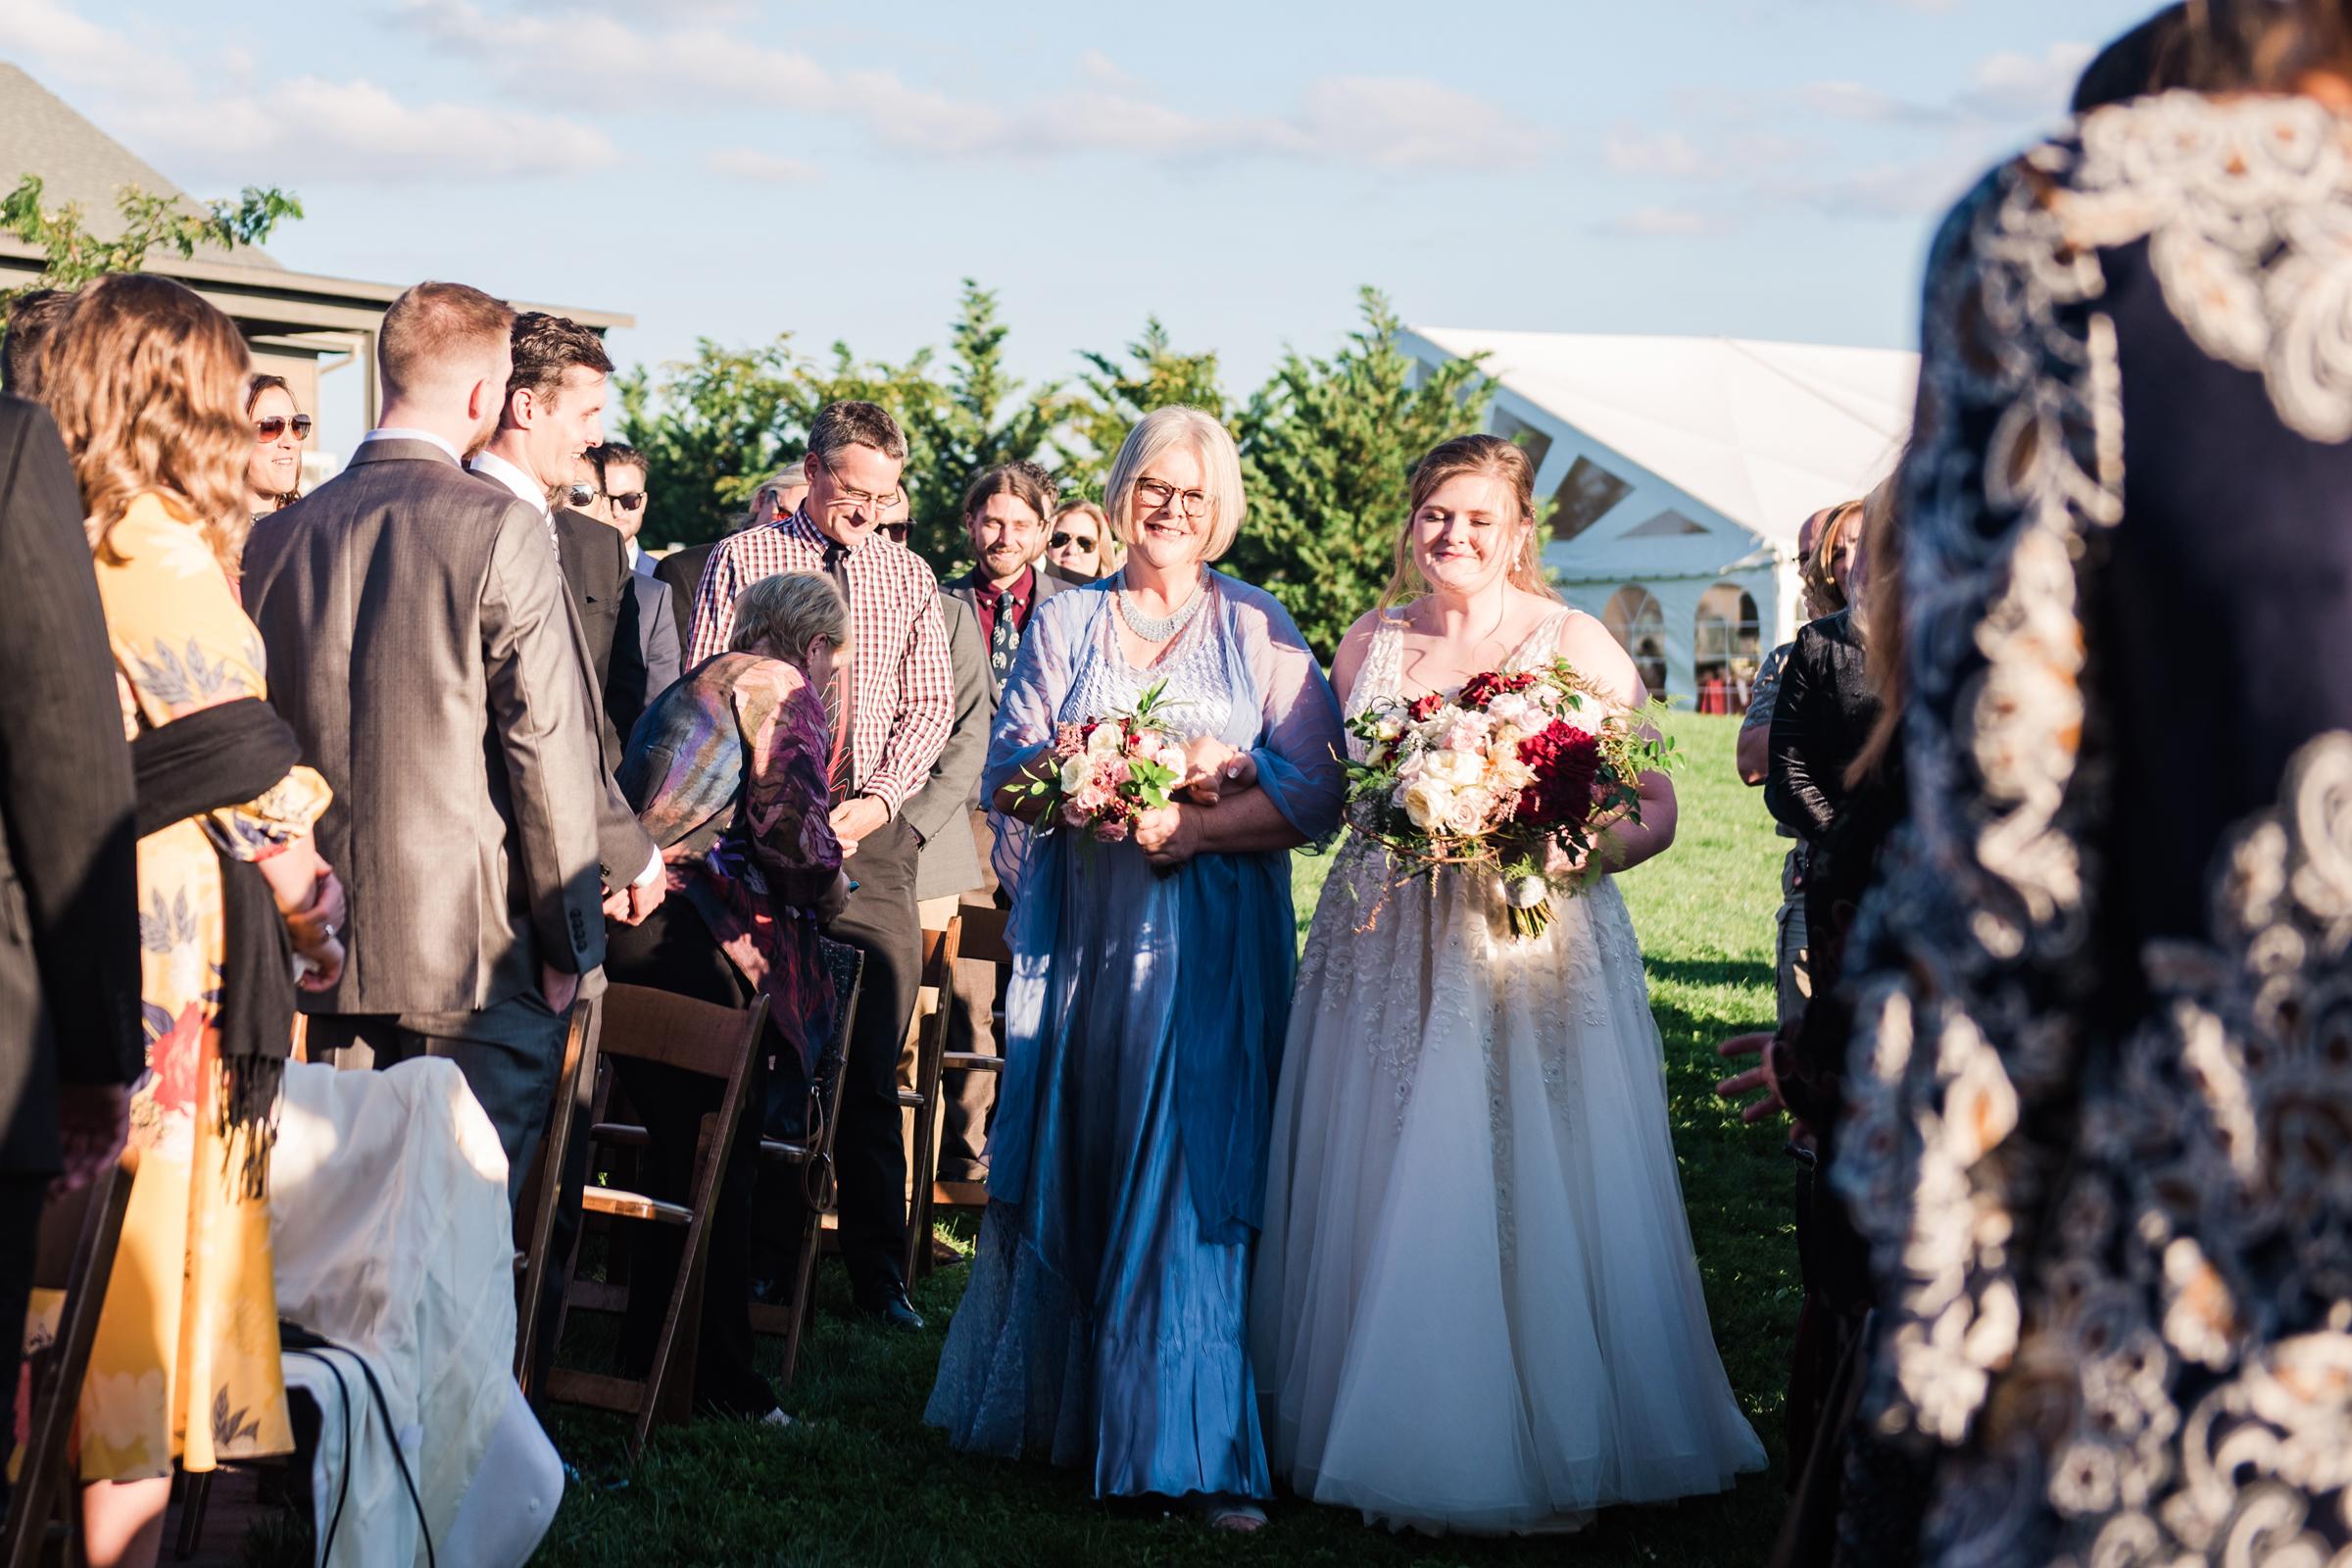 Zugibe_Vineyards_Finger_Lakes_Wedding_JILL_STUDIO_Rochester_NY_Photographer_DSC_3969.jpg